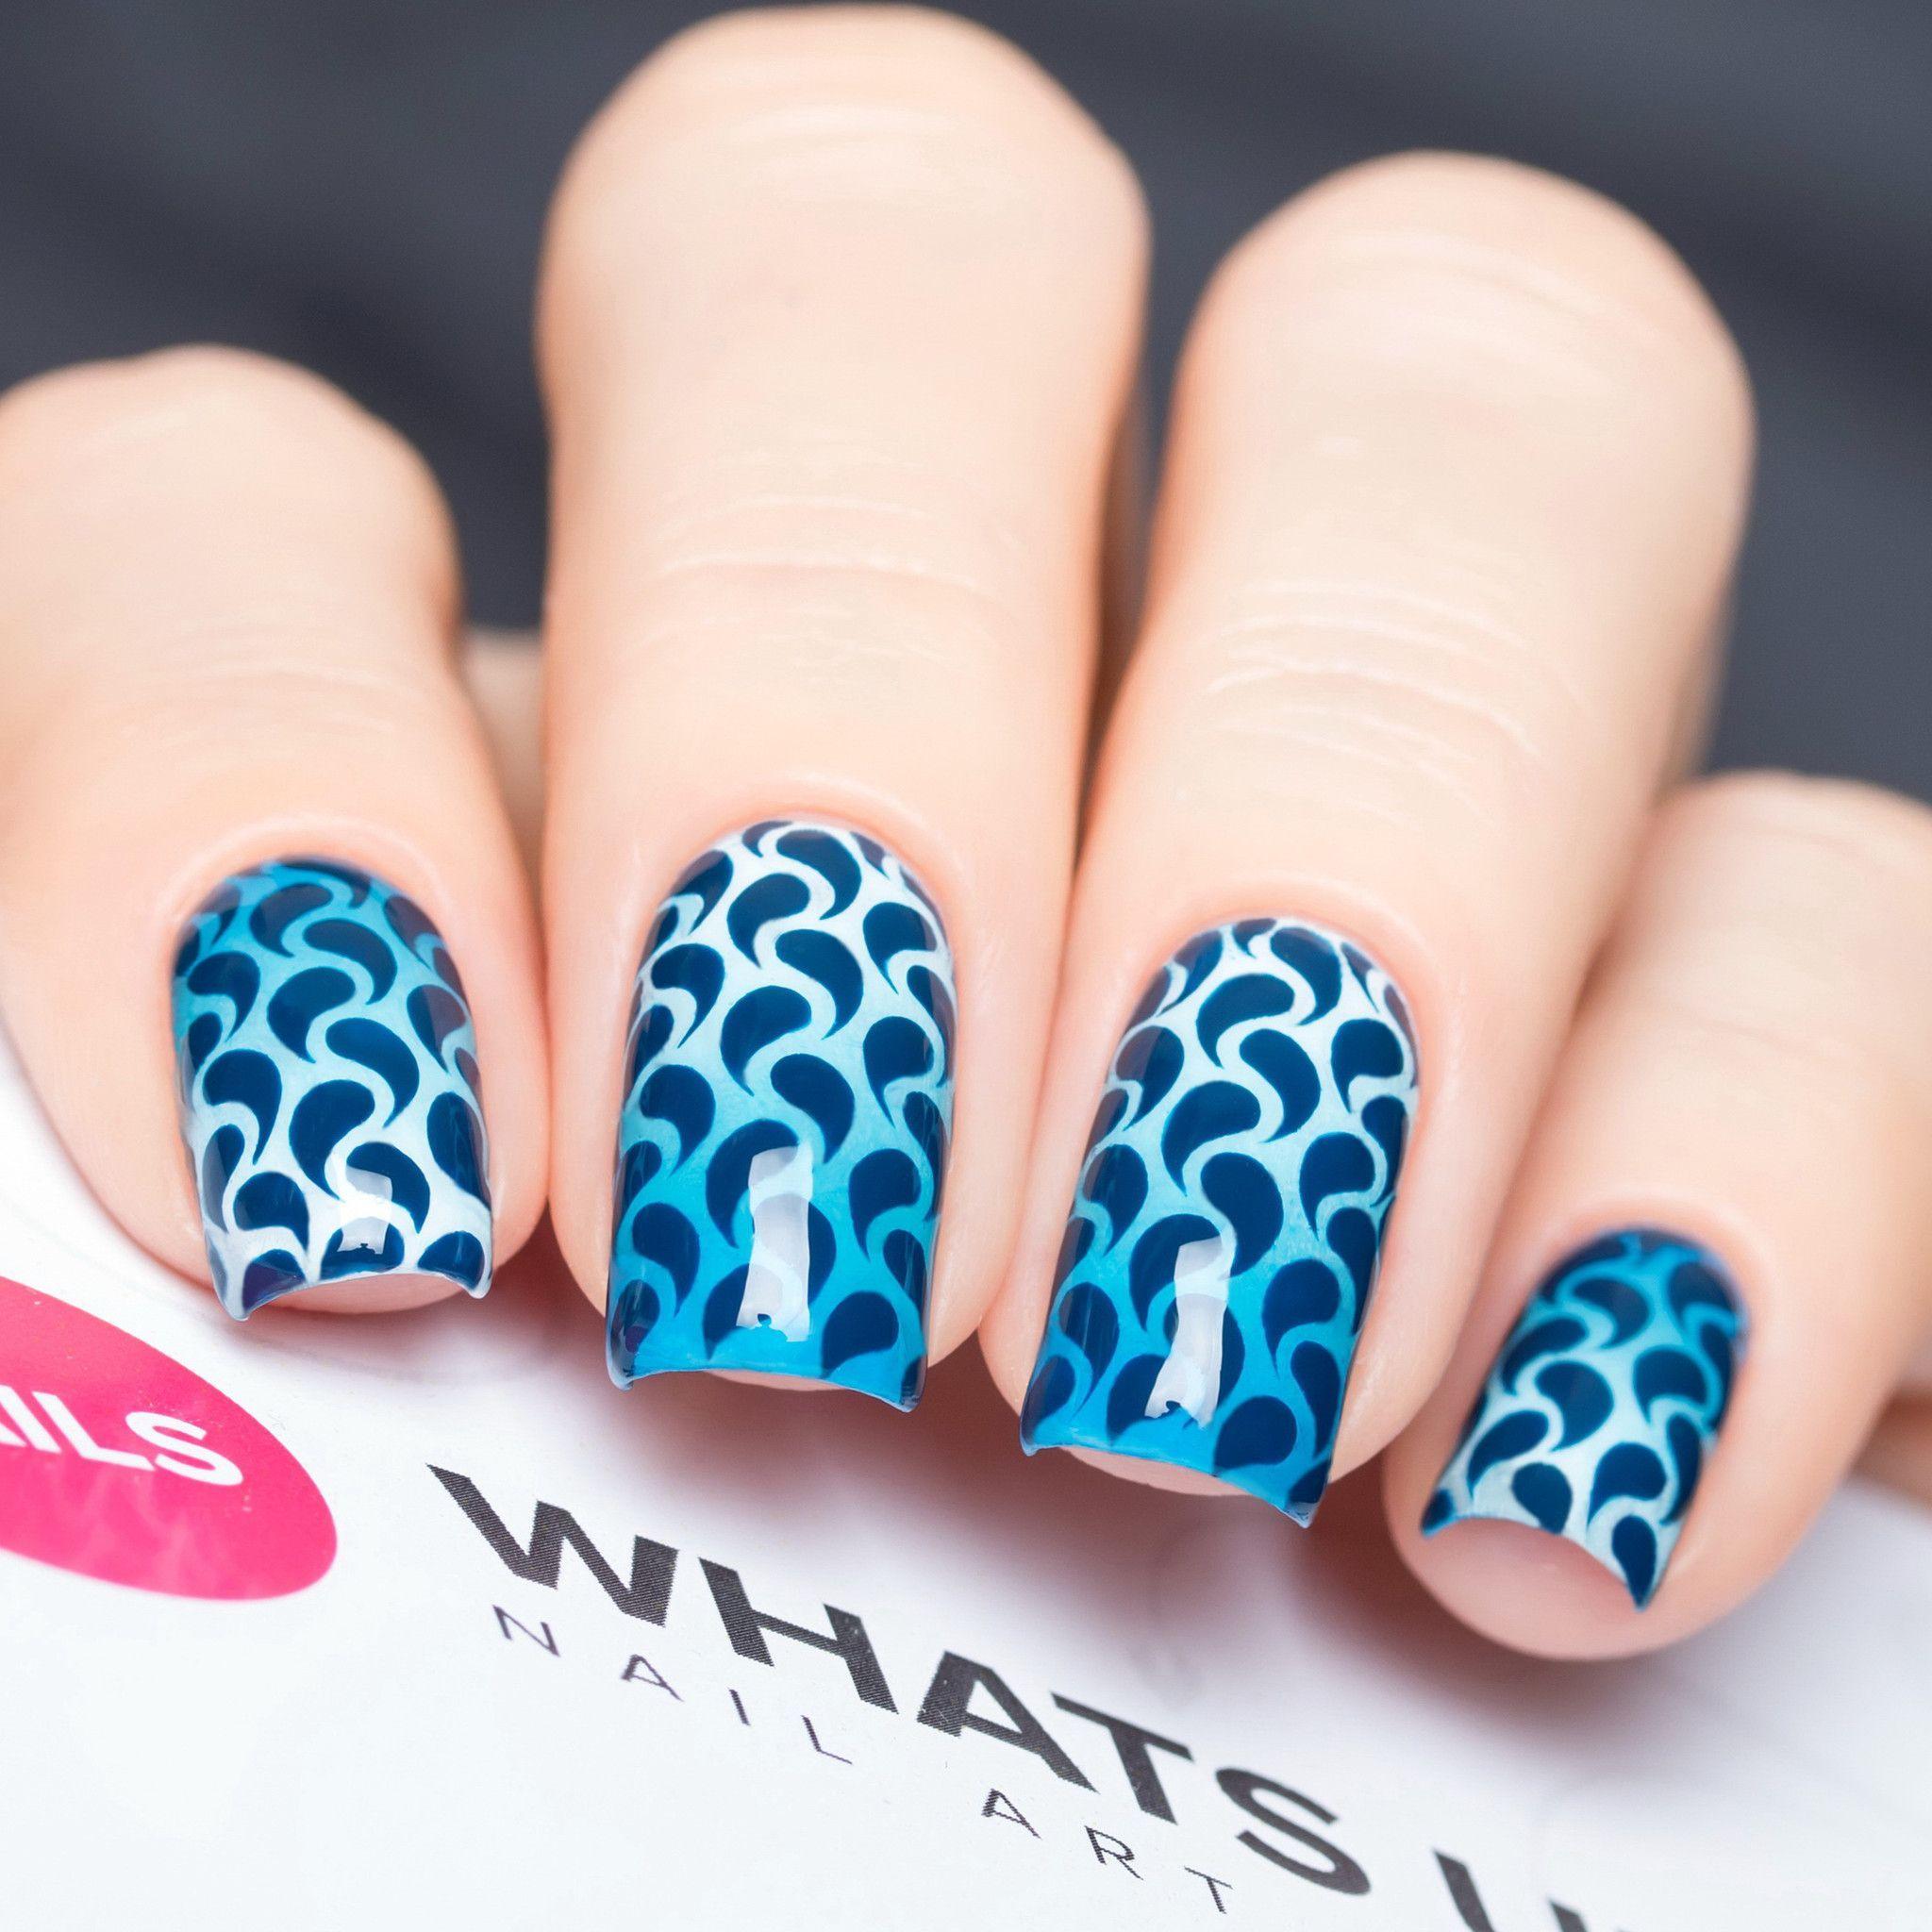 Whats Up Nails / Droplets Stickers & Stencils | Nails | Nail art ...